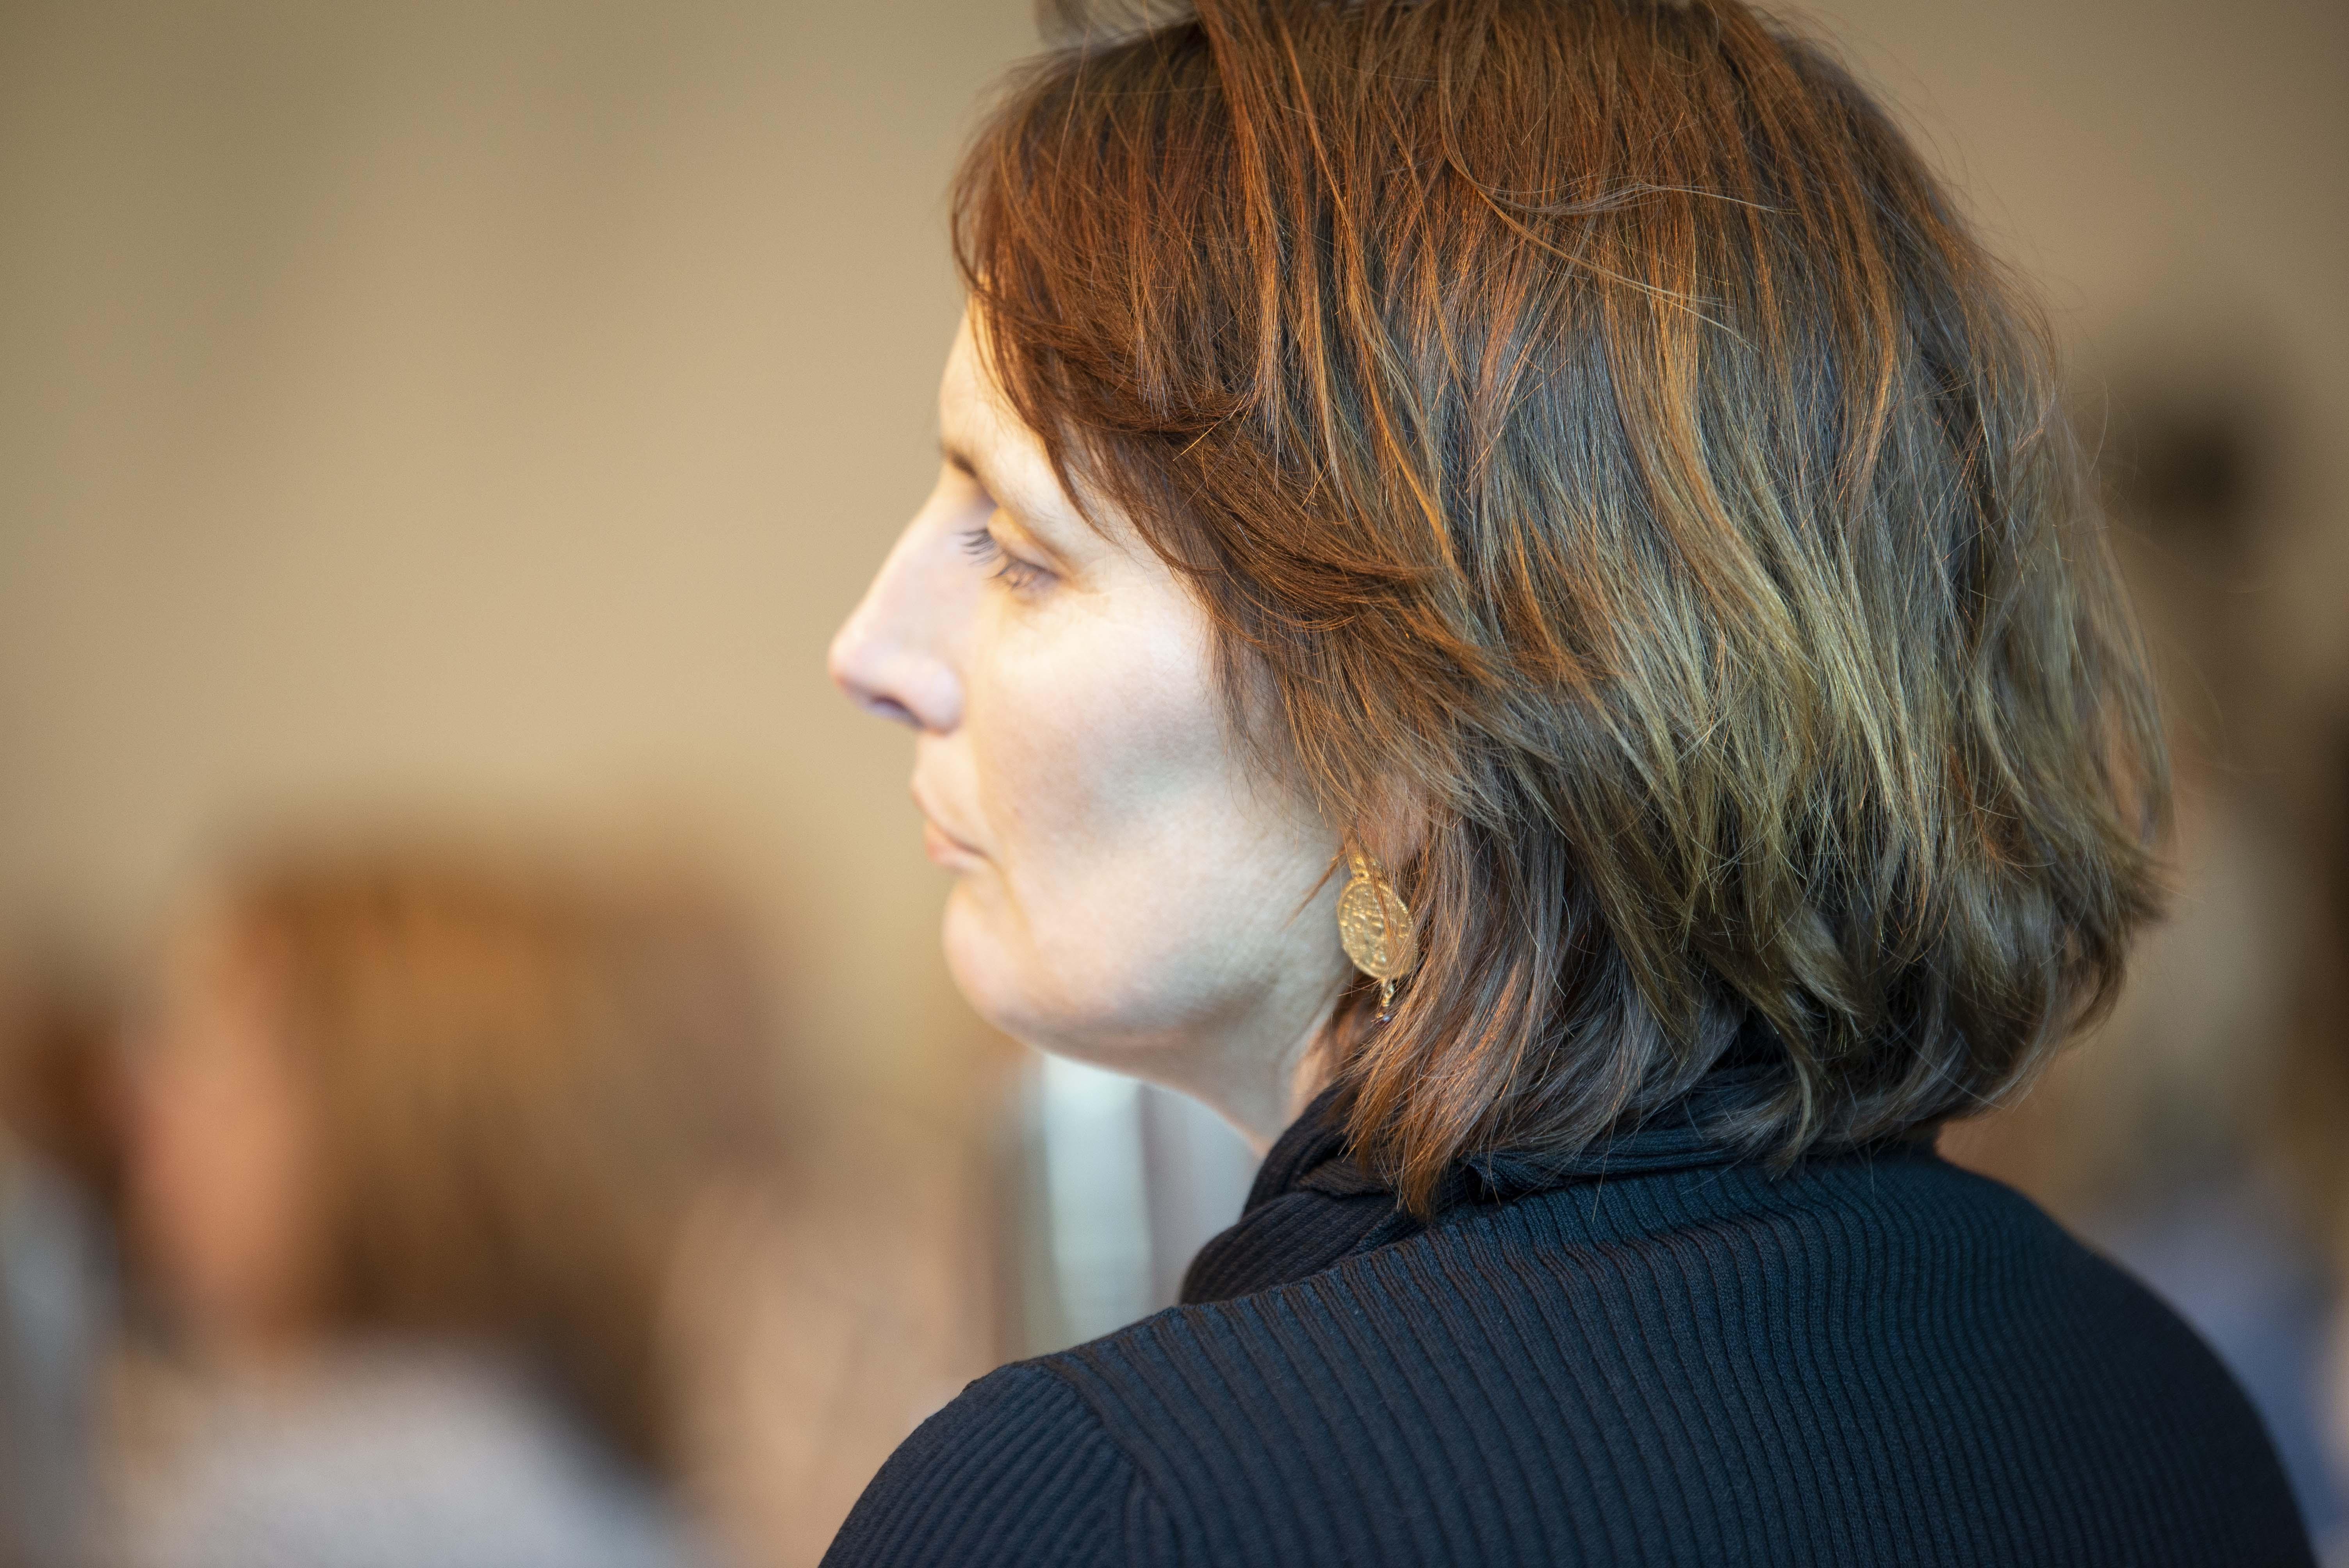 Leah van Poppel, Gerard Brody, Kristy McKellar, Dr Meg Clement-Couzner